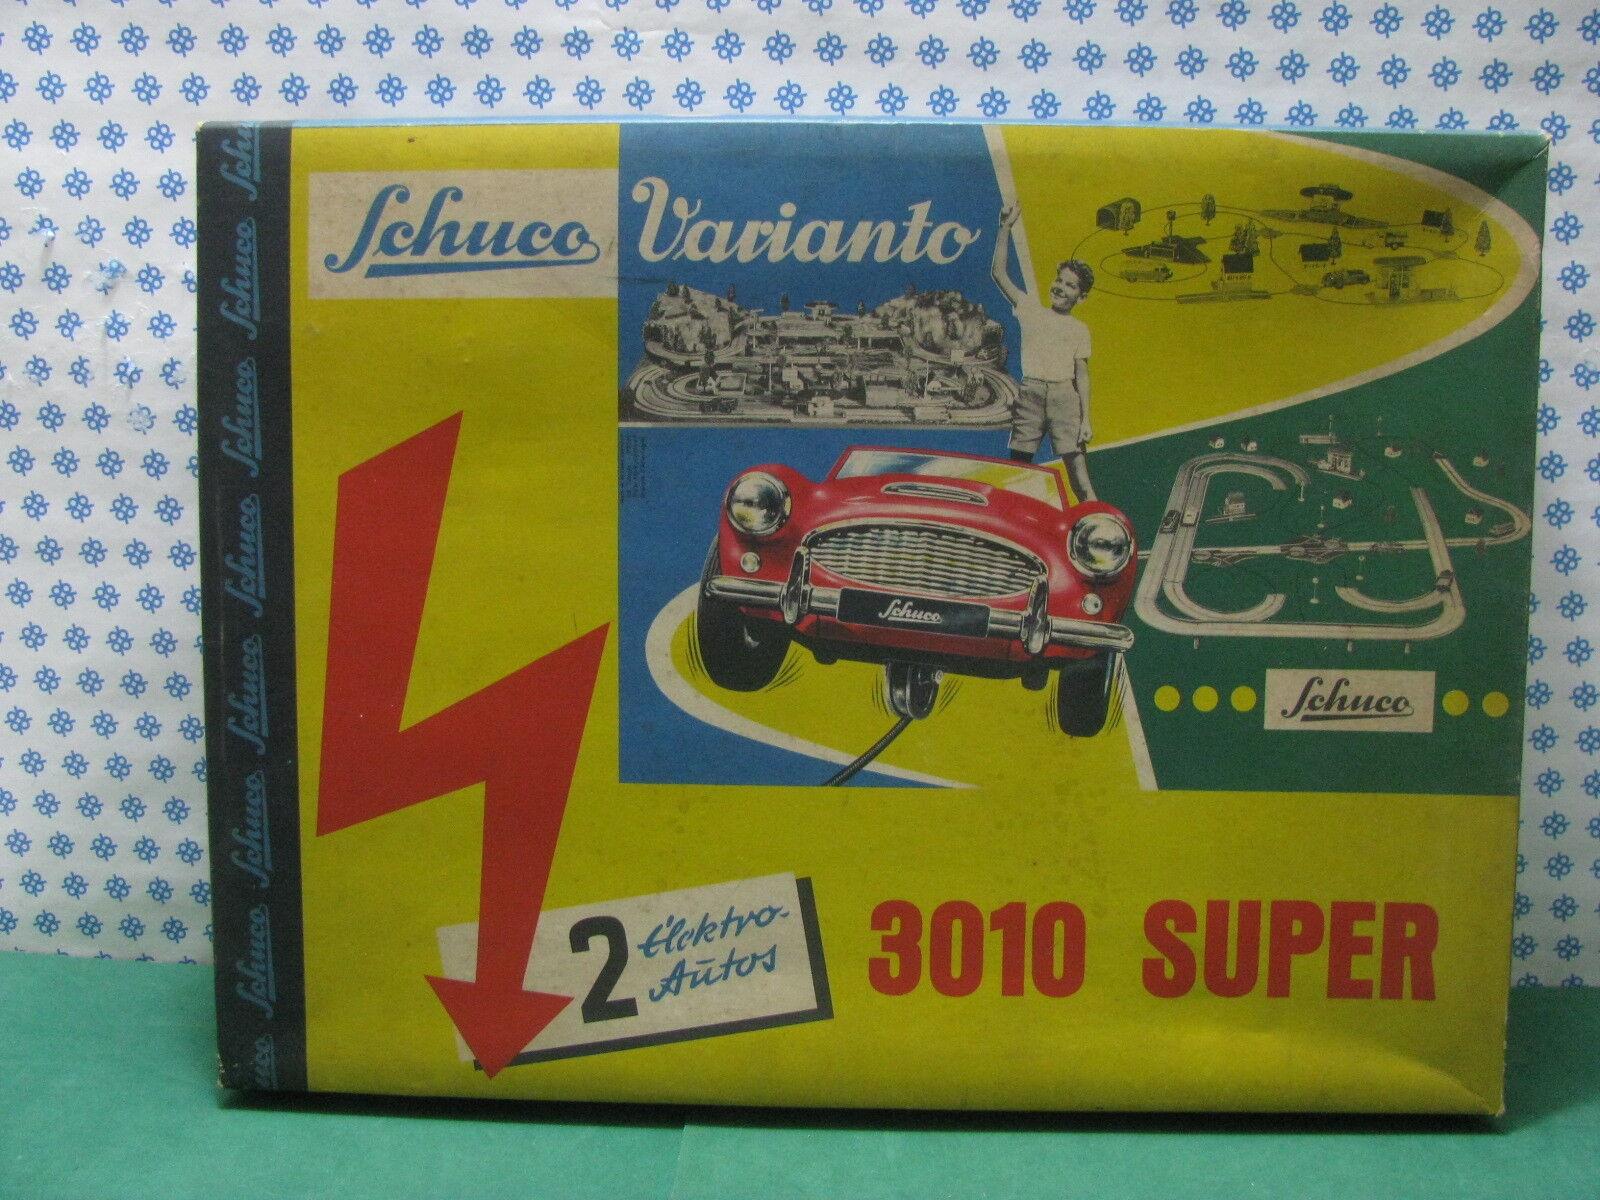 SCHUCO Varianto 3010 Super - 2 ELEKTRO AUTOS-Made U.S.Zone W.Germany